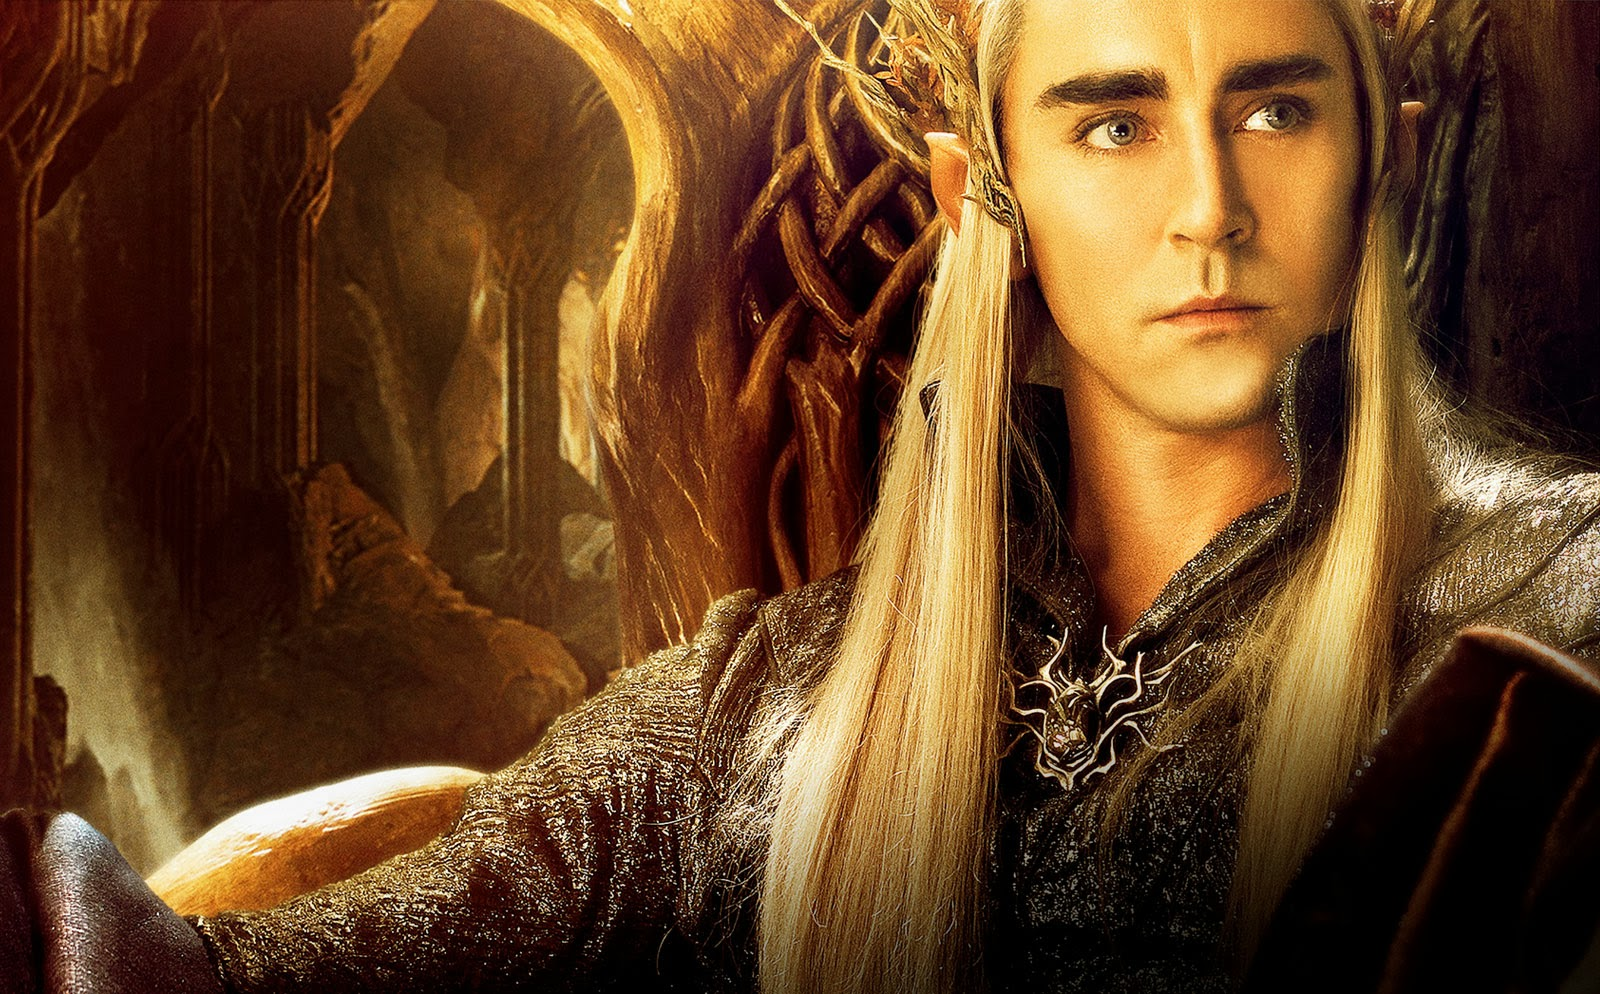 King Of The Elves Movie Wallpaper Wallpaper WallpaperMinecom 1600x994